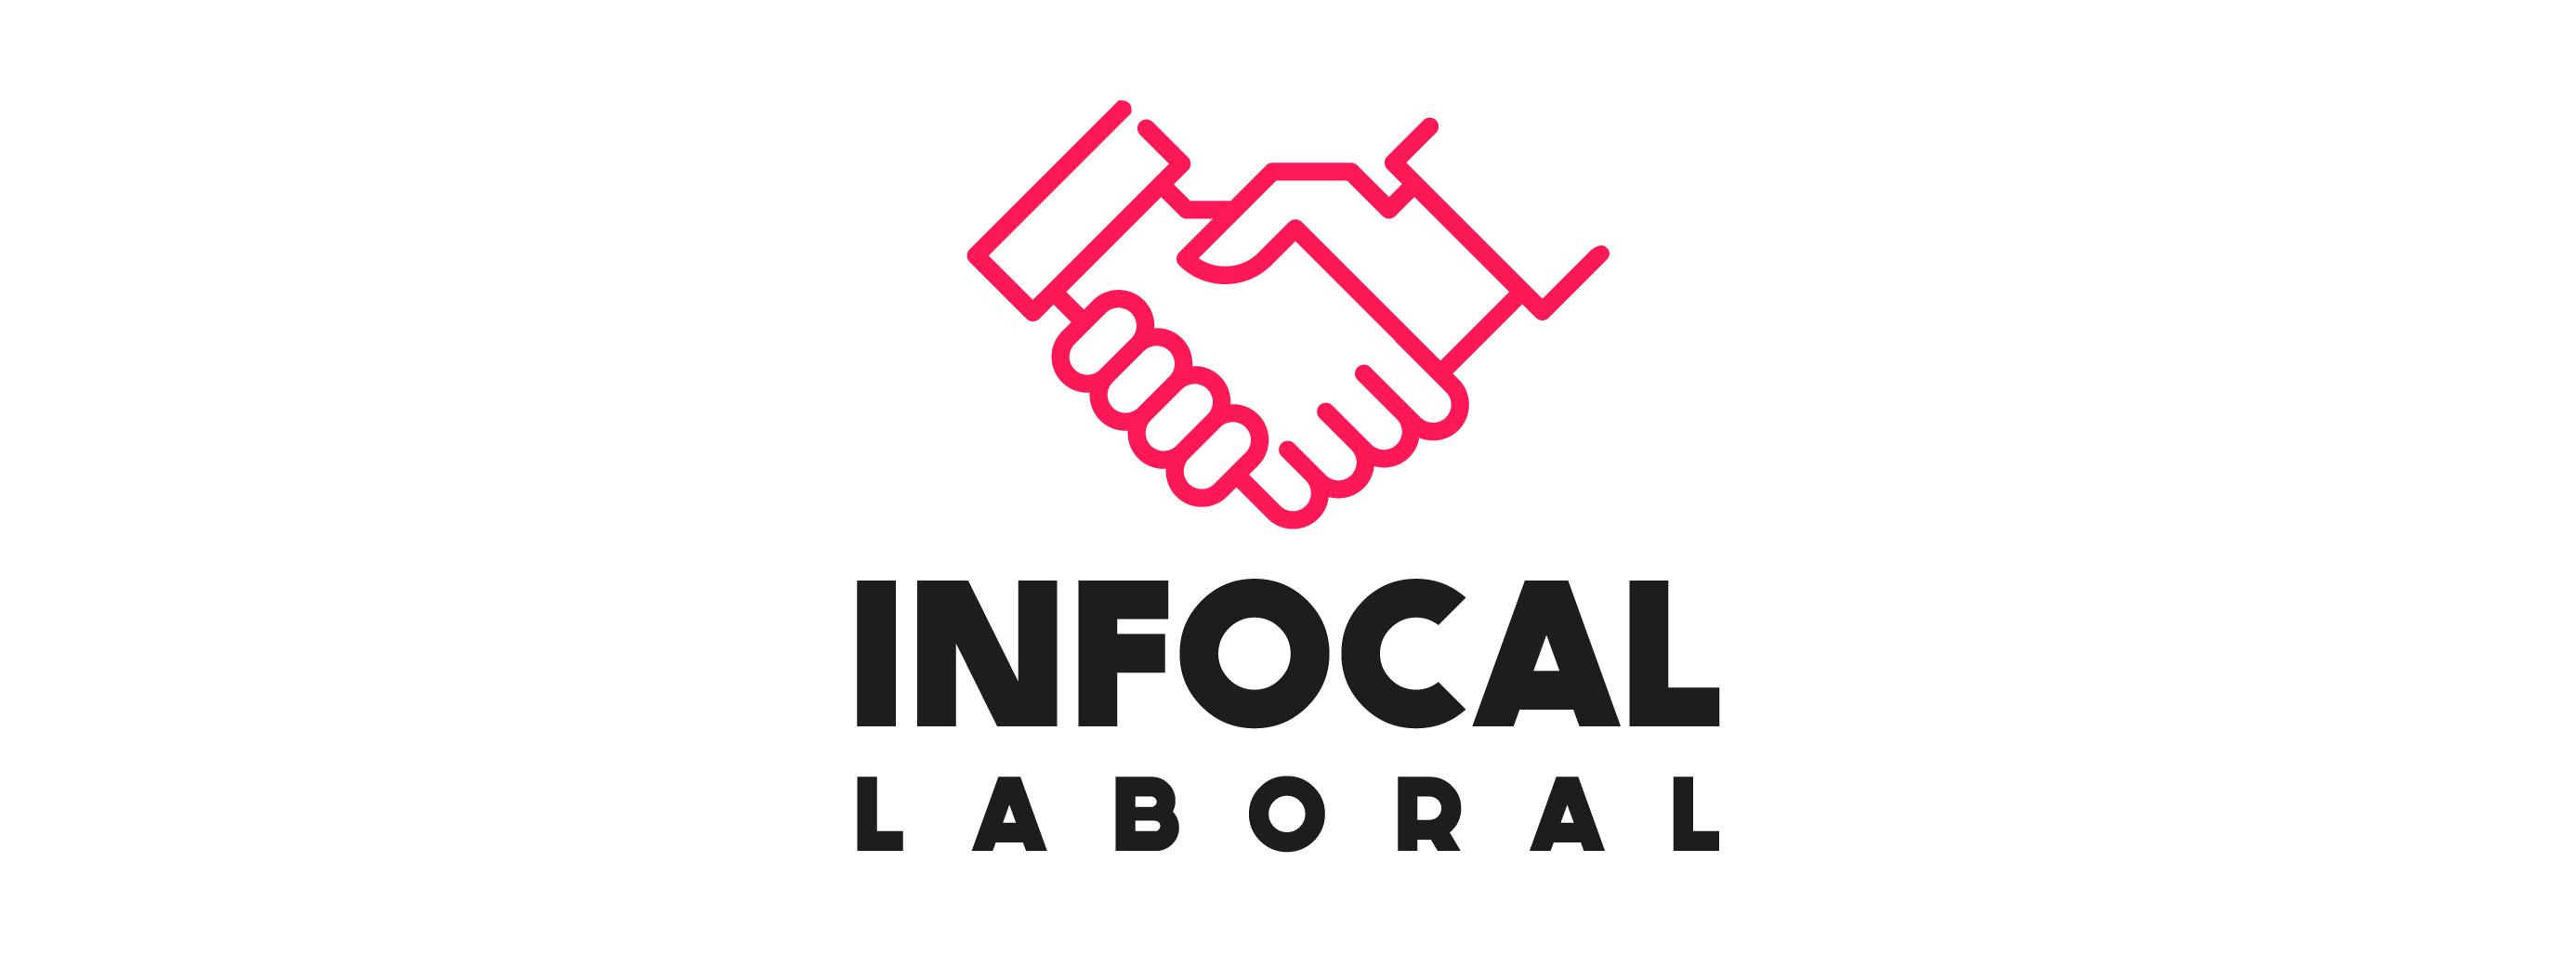 InfocalLaboral